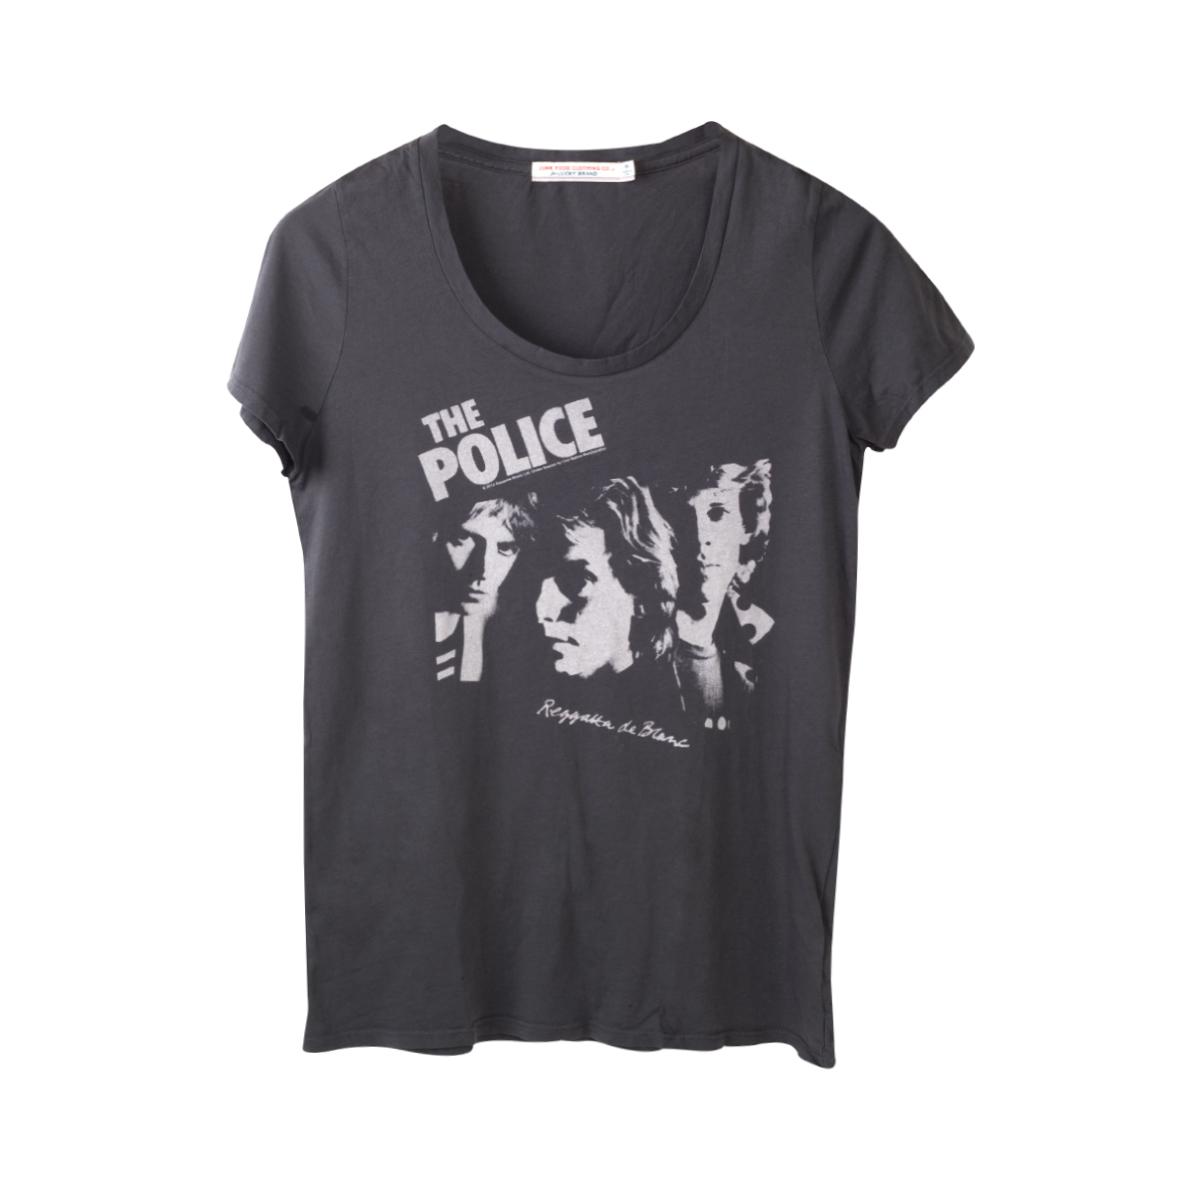 The Police Women's Scoop Neck Regatta de Blanc T-Shirt